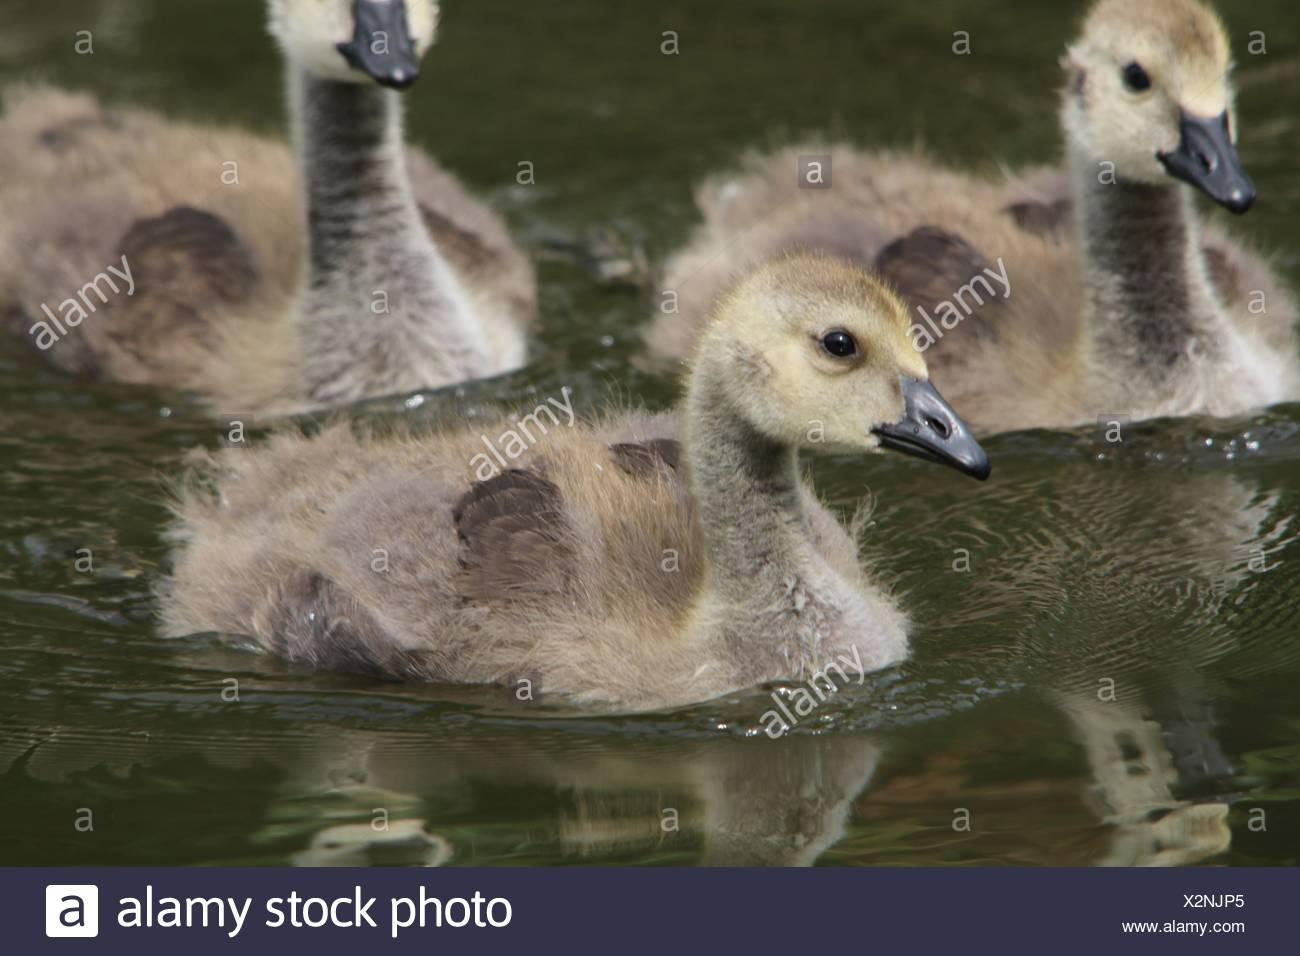 Three Mallard Ducklings - Stock Image